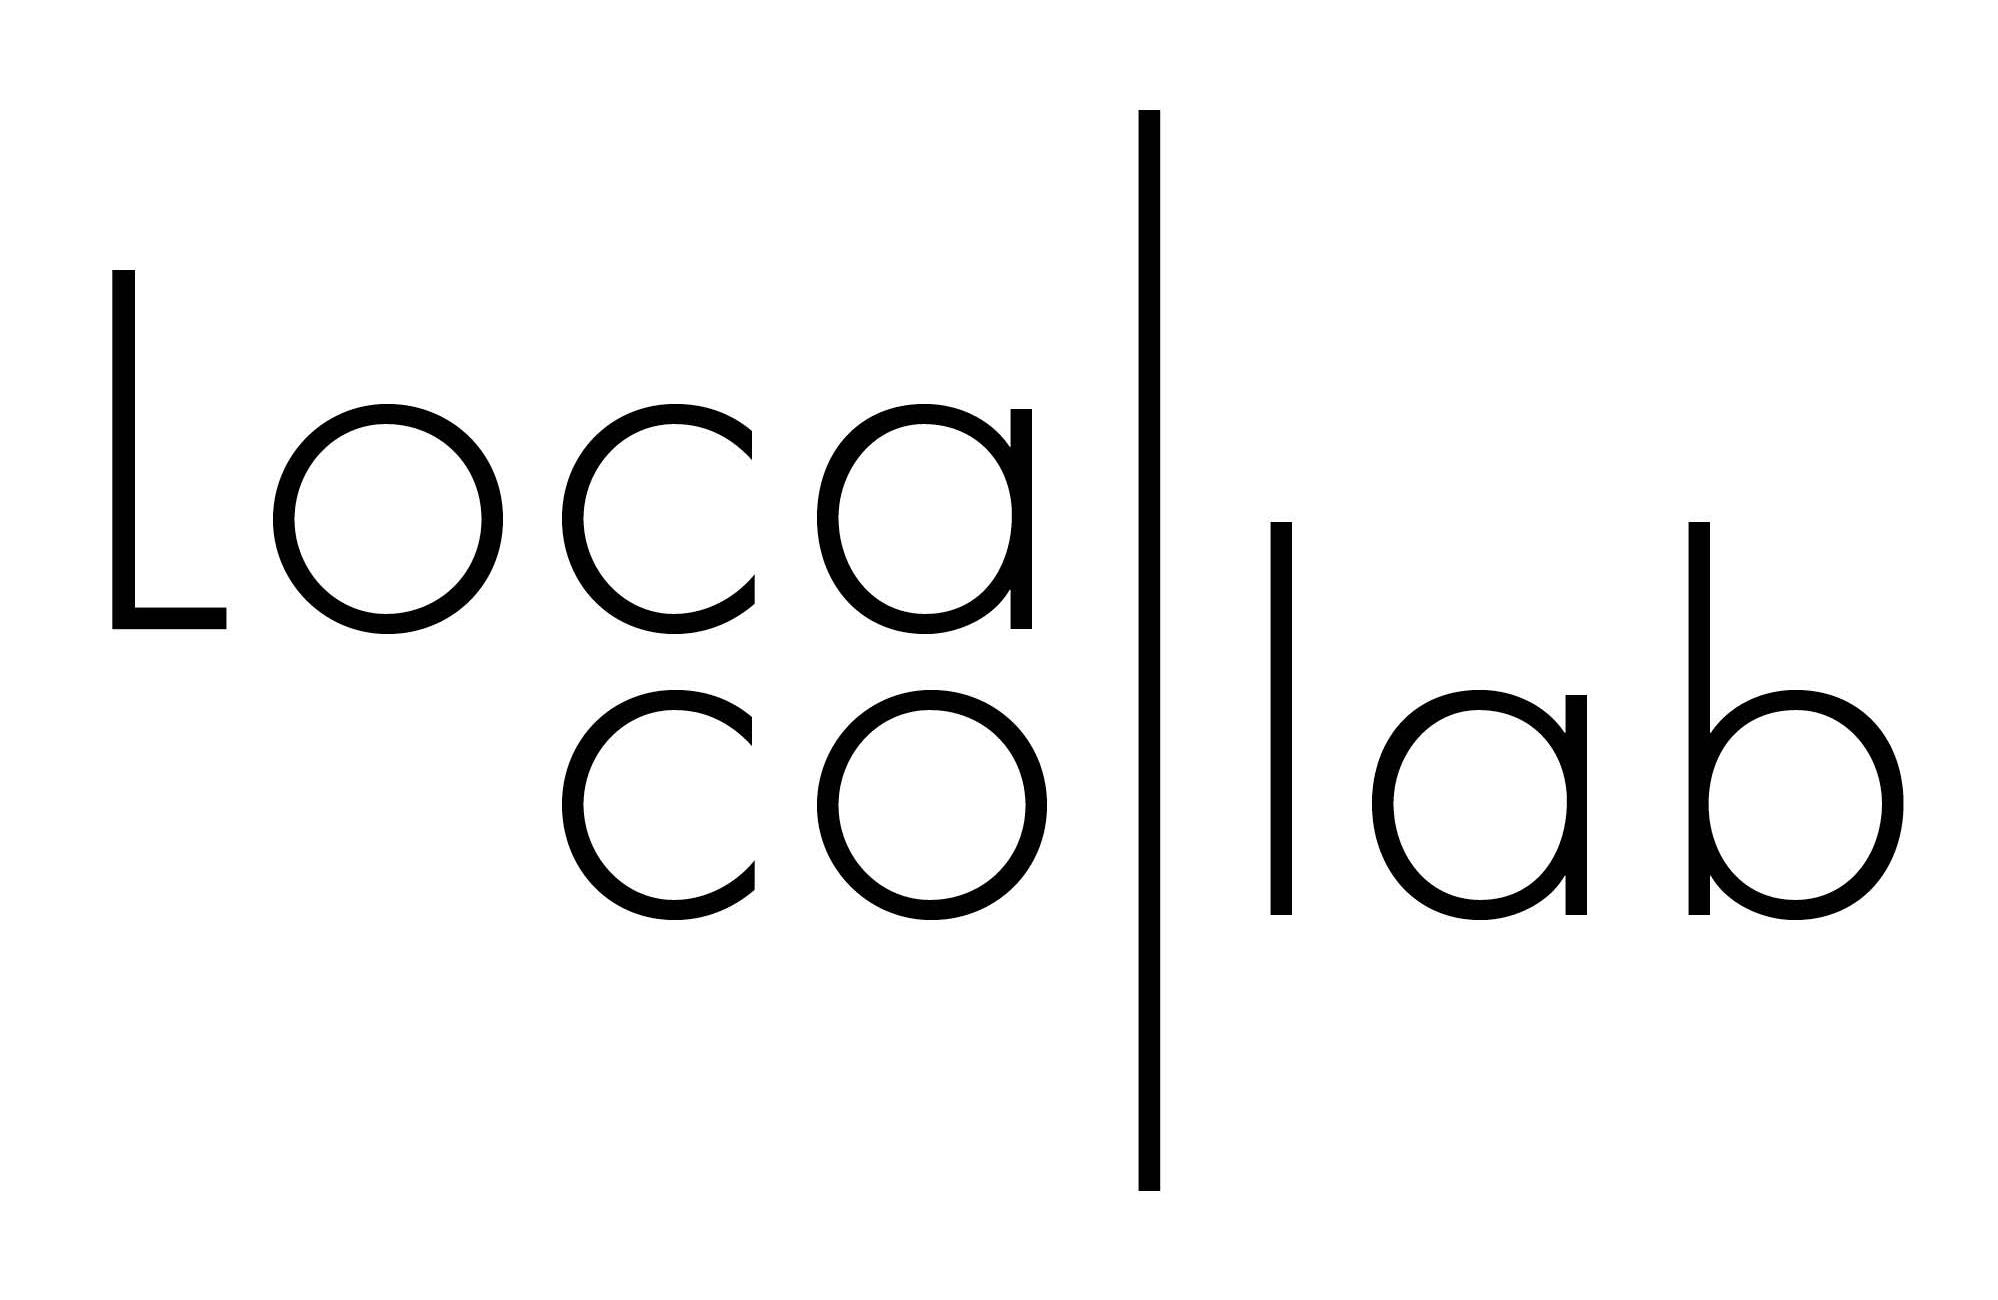 logo local collab2